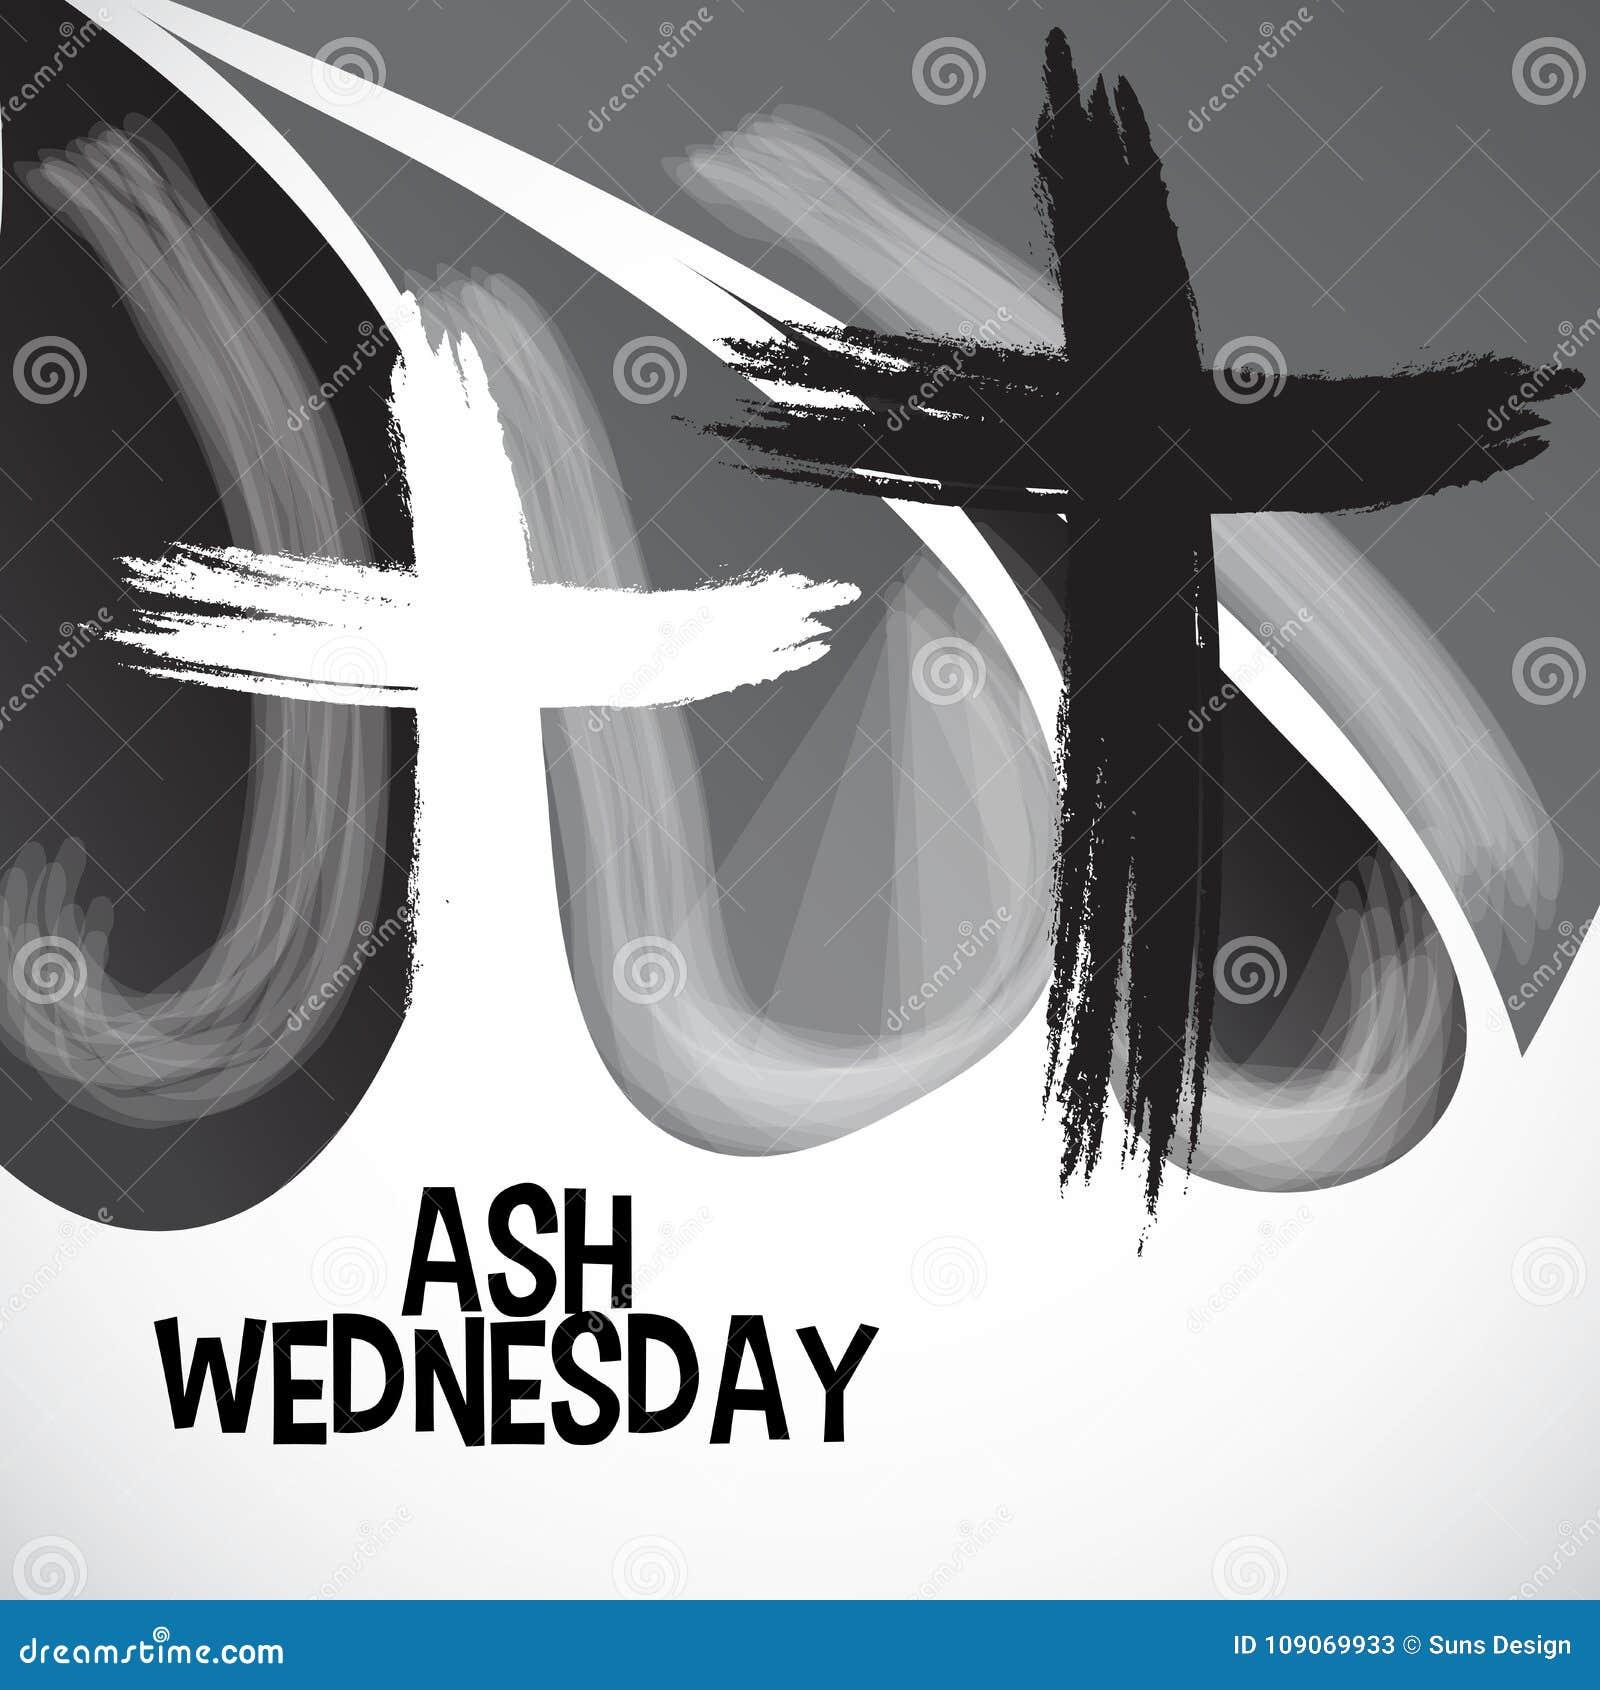 Ash wednesday stock illustration illustration of sinner 109069933 ash wednesday sinner effects buycottarizona Image collections